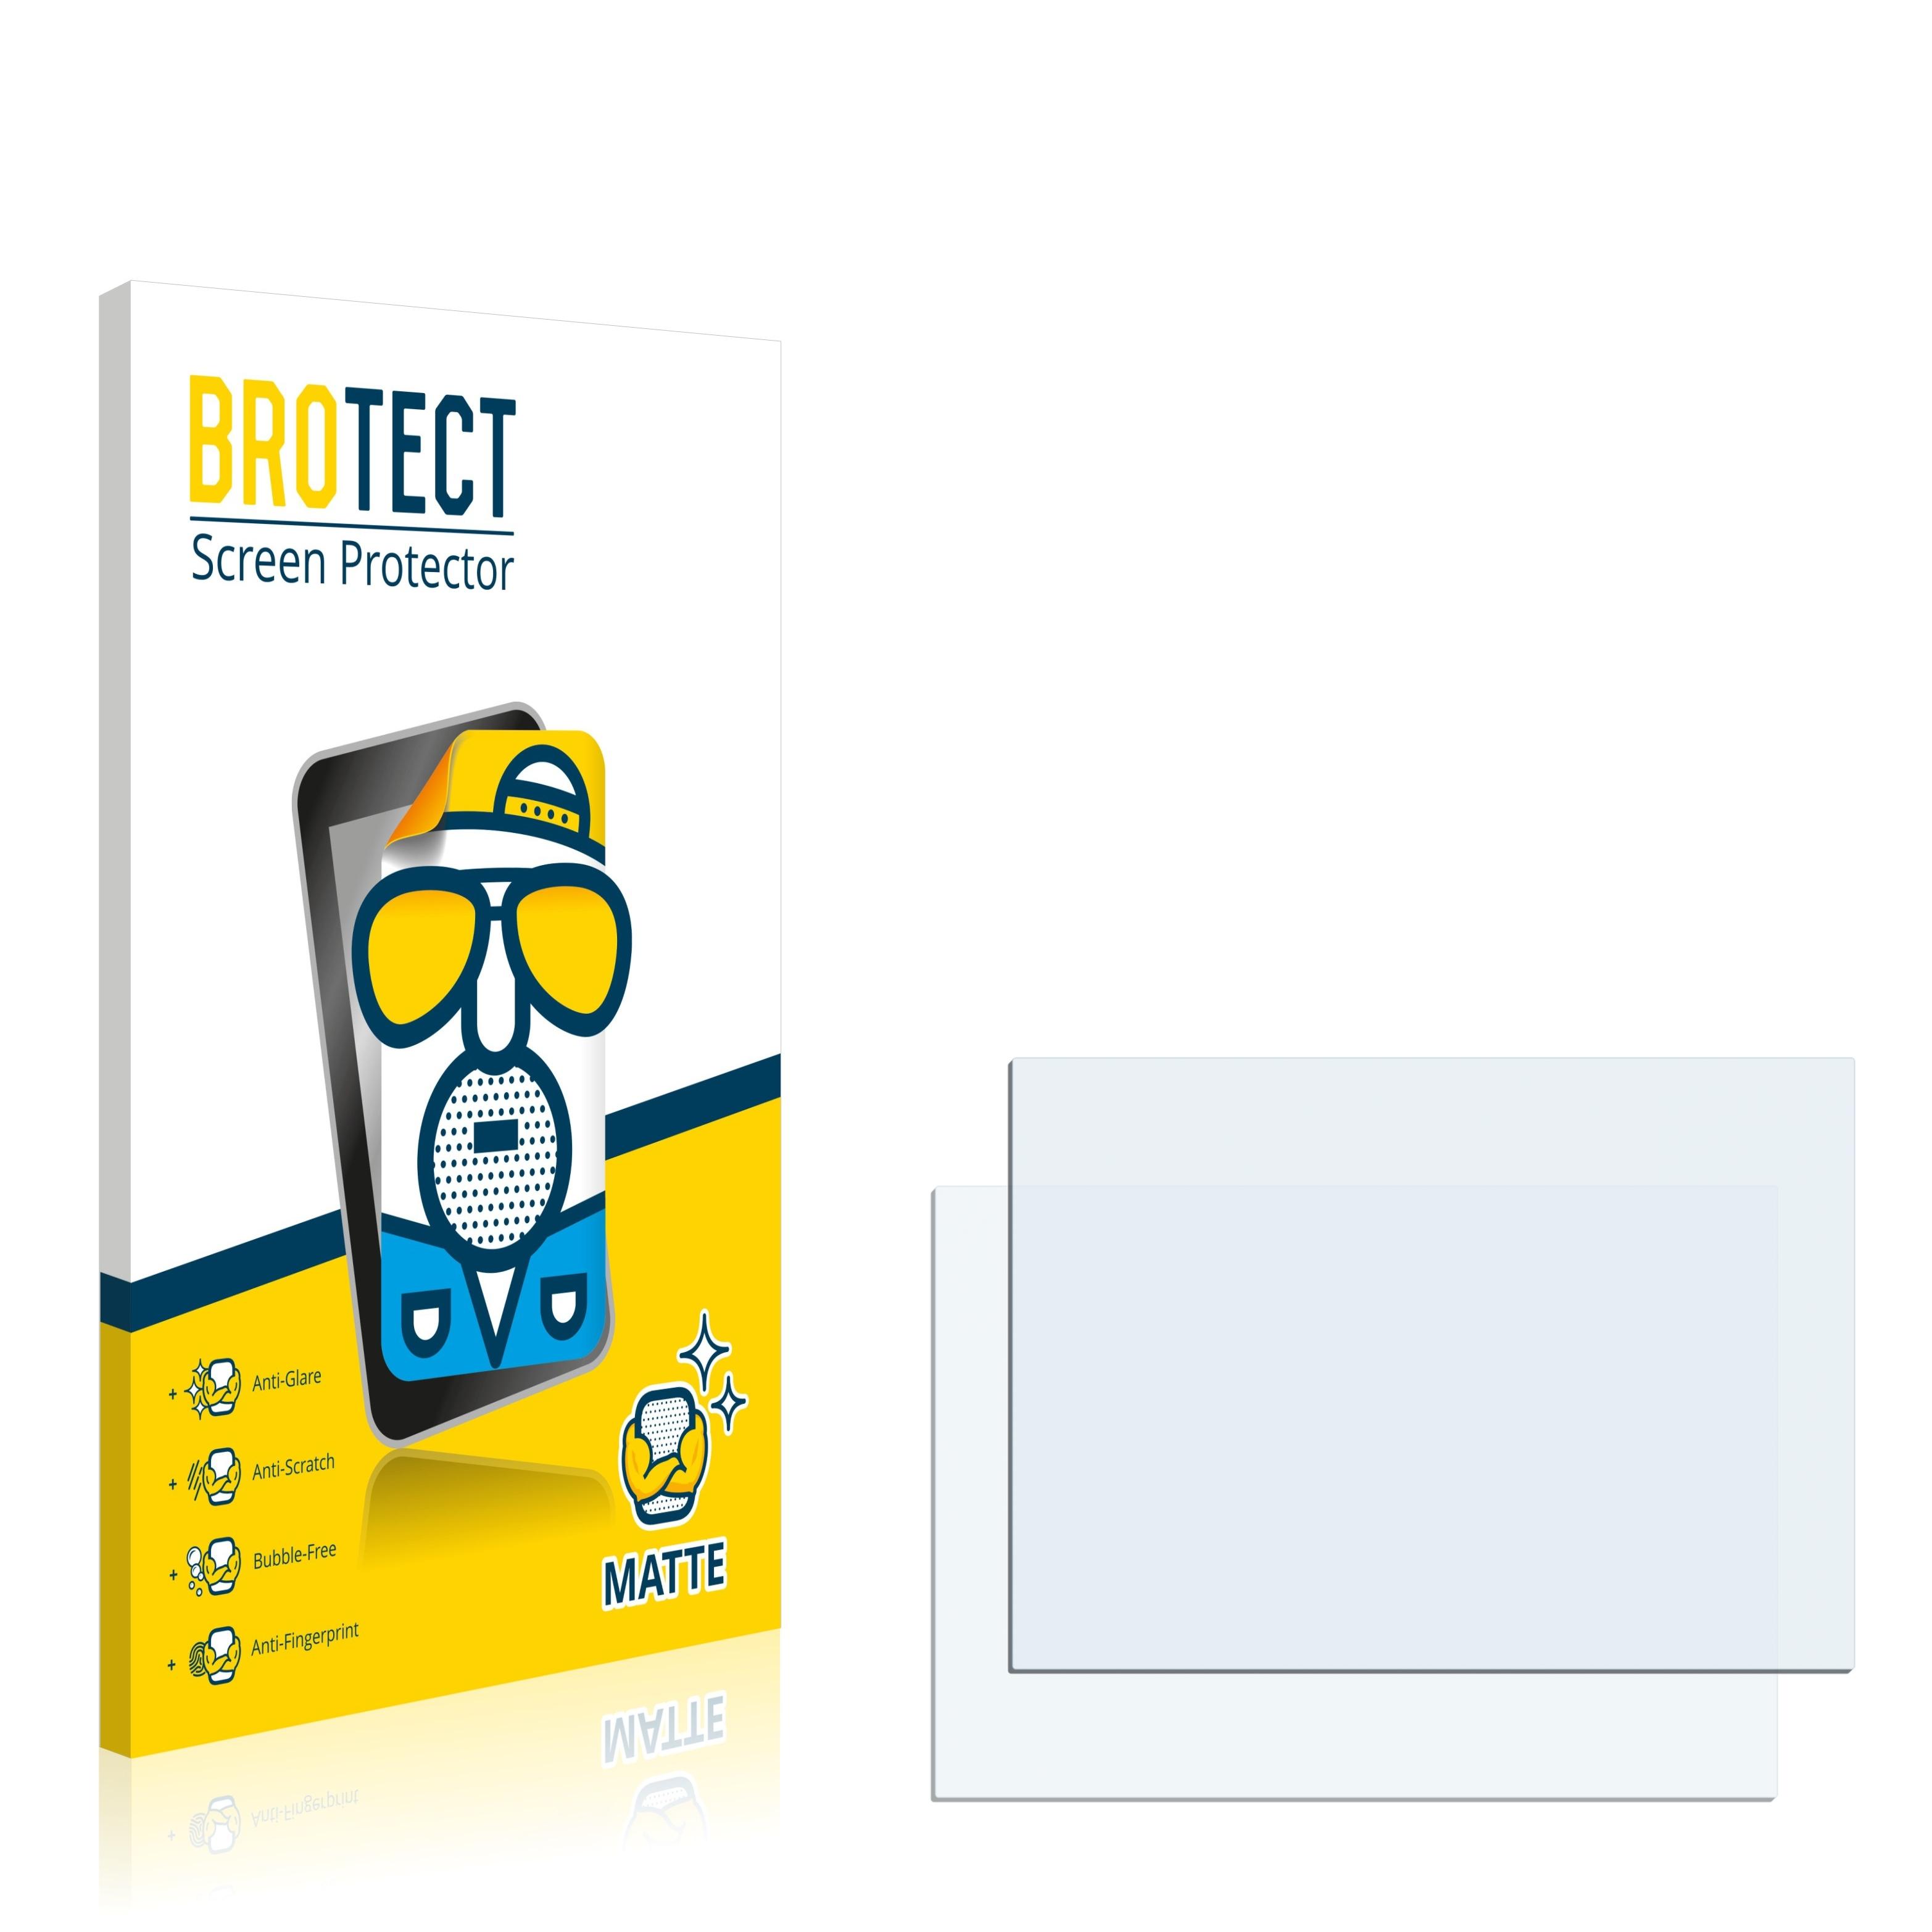 Matná ochranná fólie BROTECT pro Actioncam X7, 2 ks